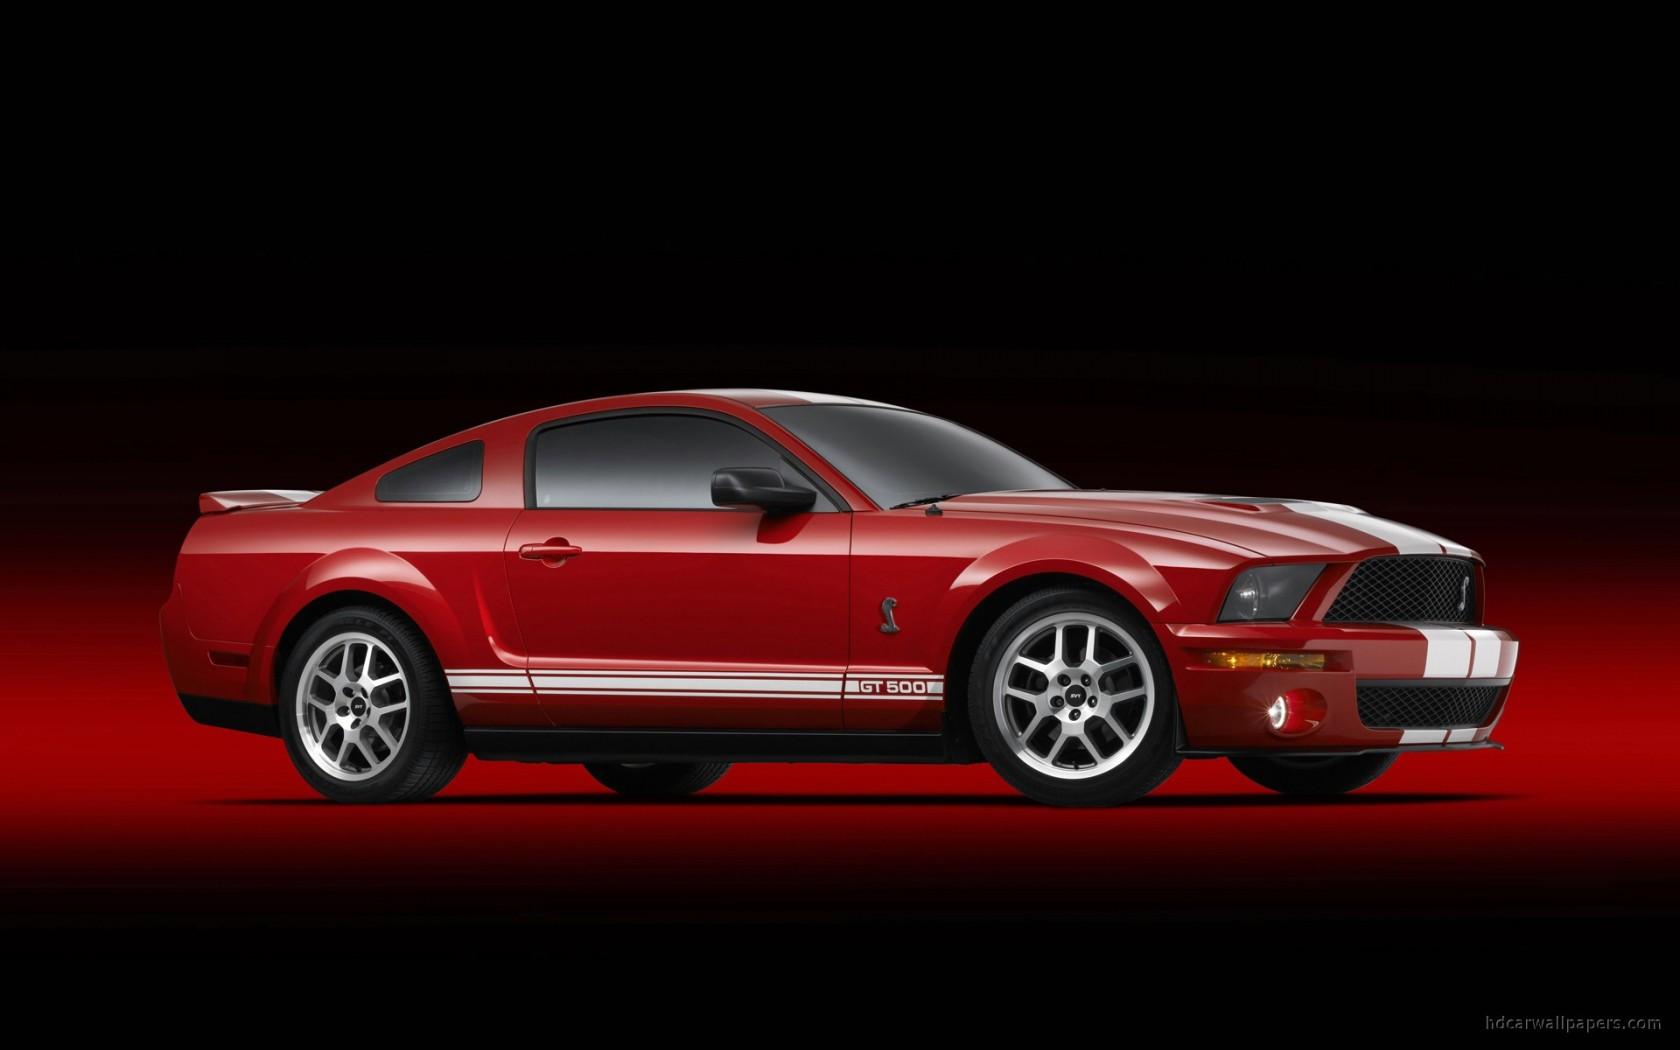 Shelby cobra gt500 mustang 5 wallpaper hd car wallpapers - Wallpaper mustang shelby gt500 ...